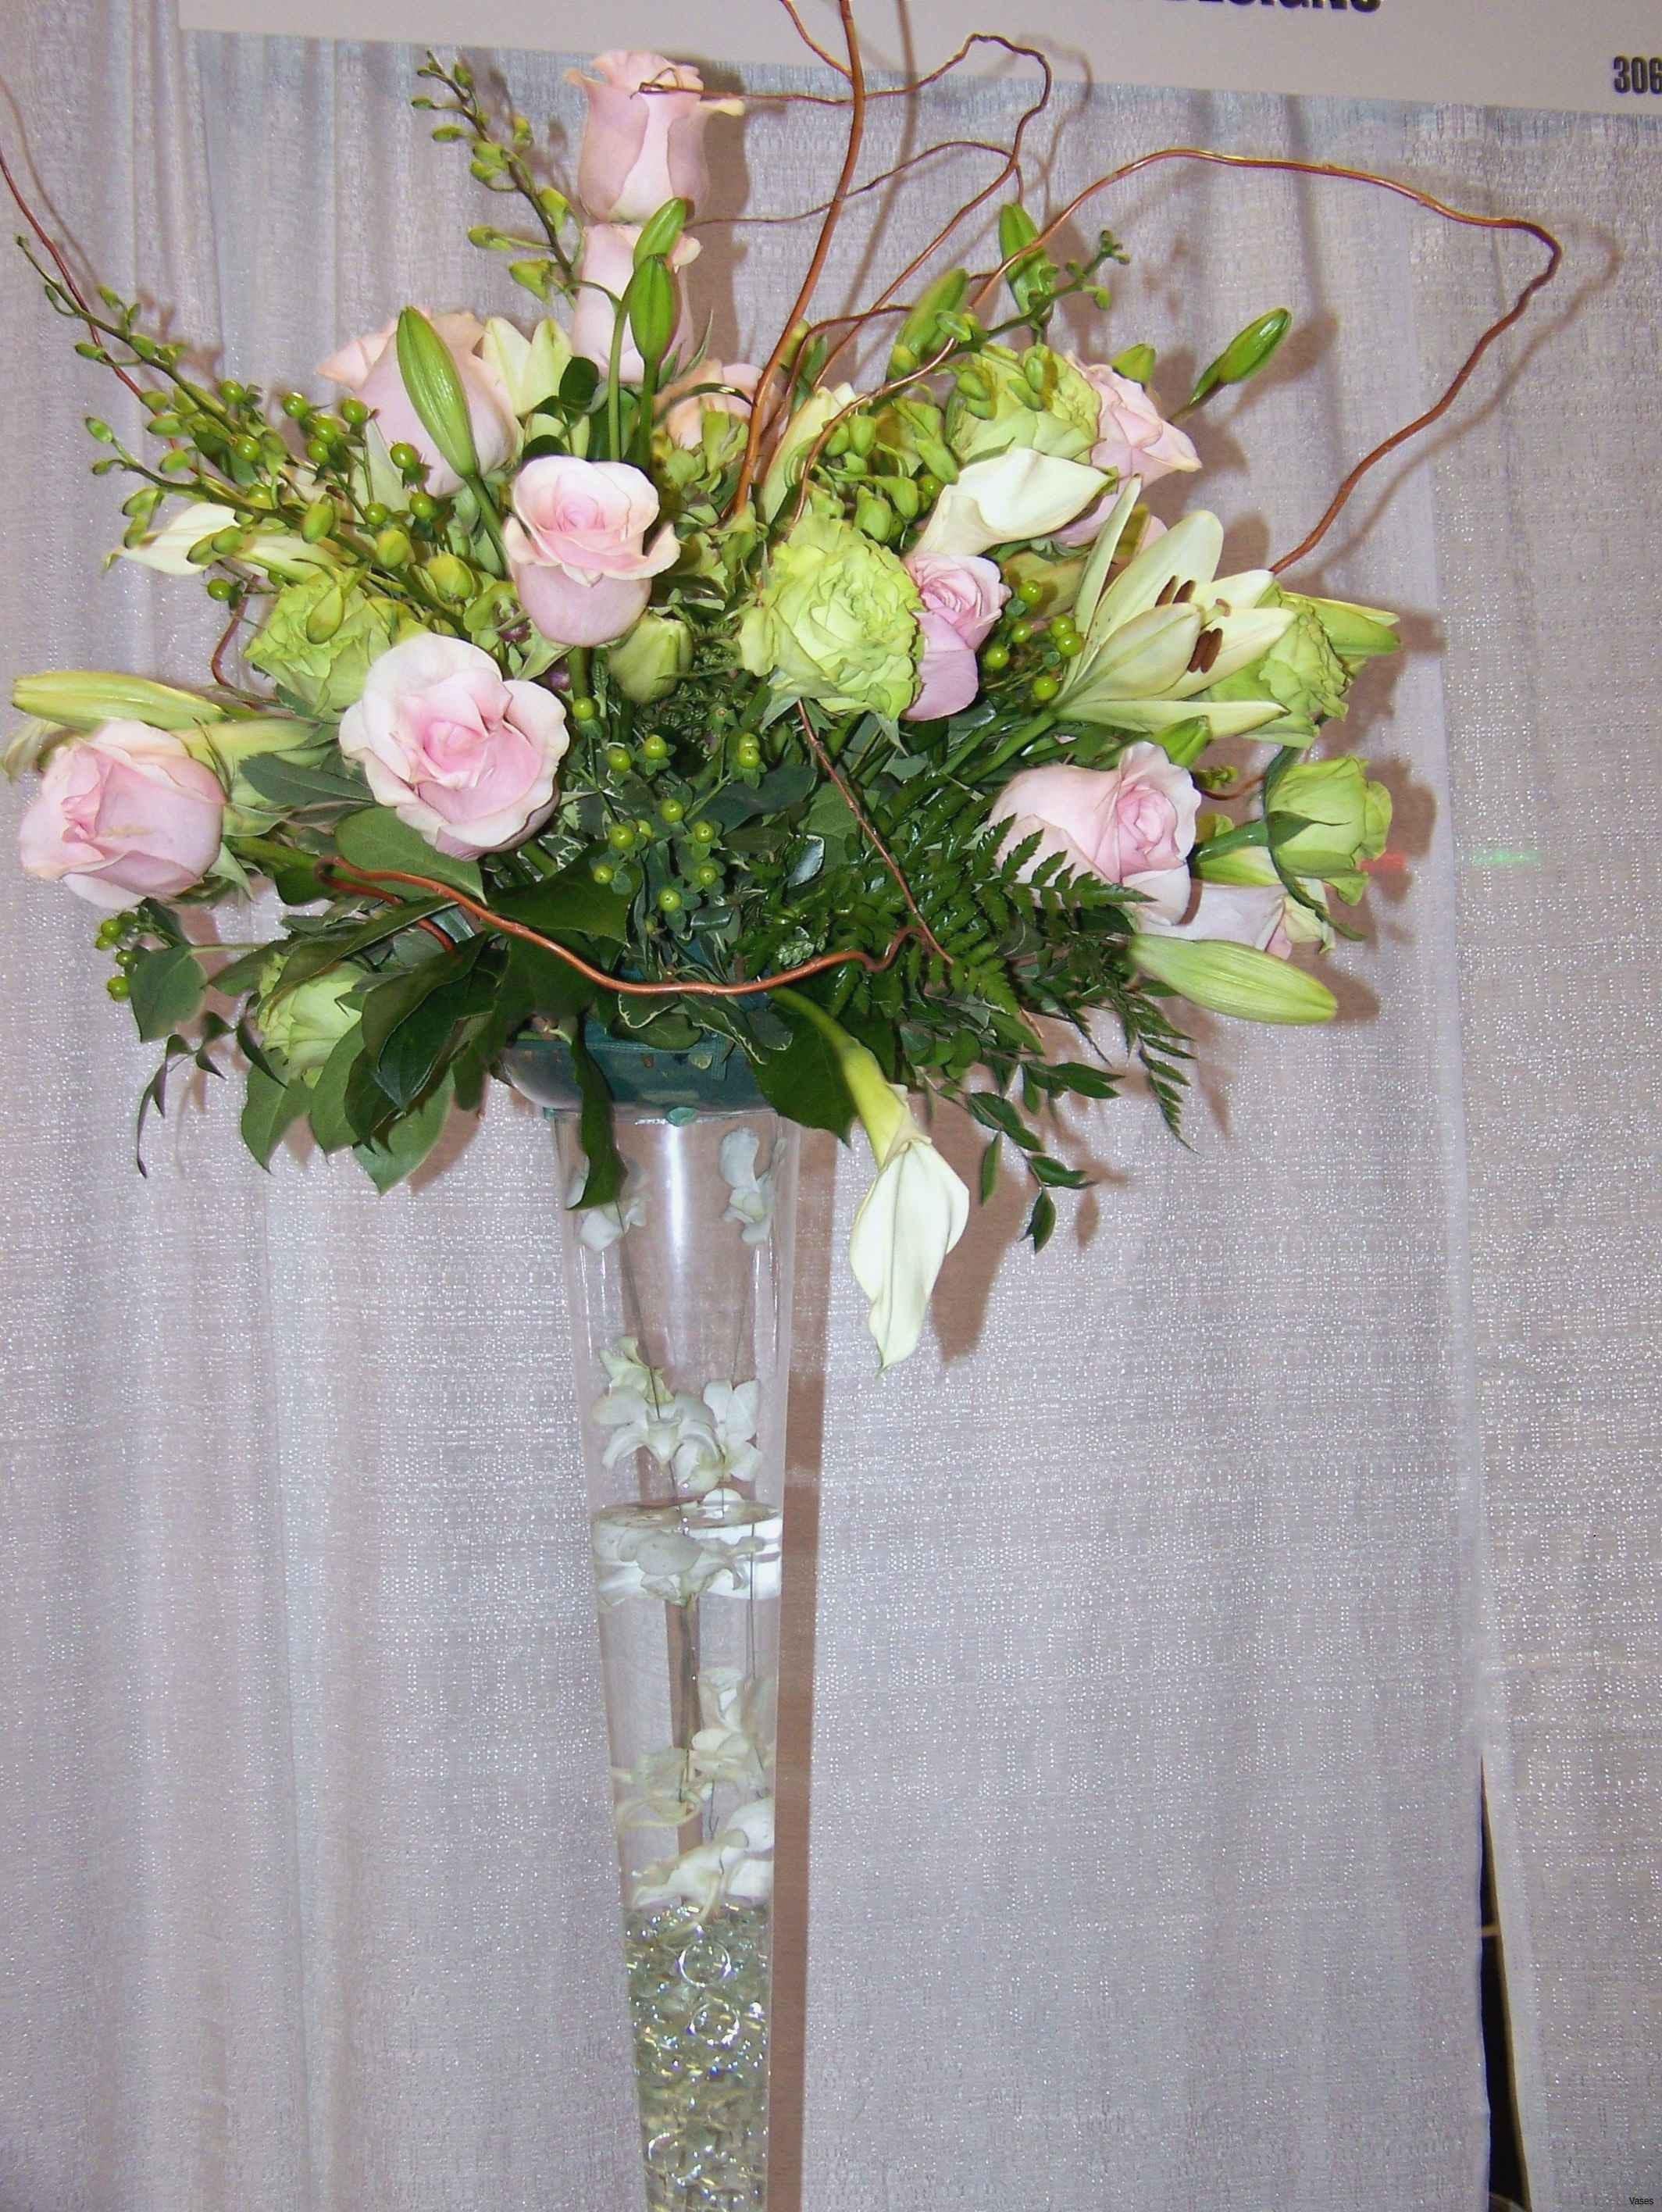 Decorative vase Ideas & 28 Amazing White Hydrangea Arrangement In Glass Vase ...